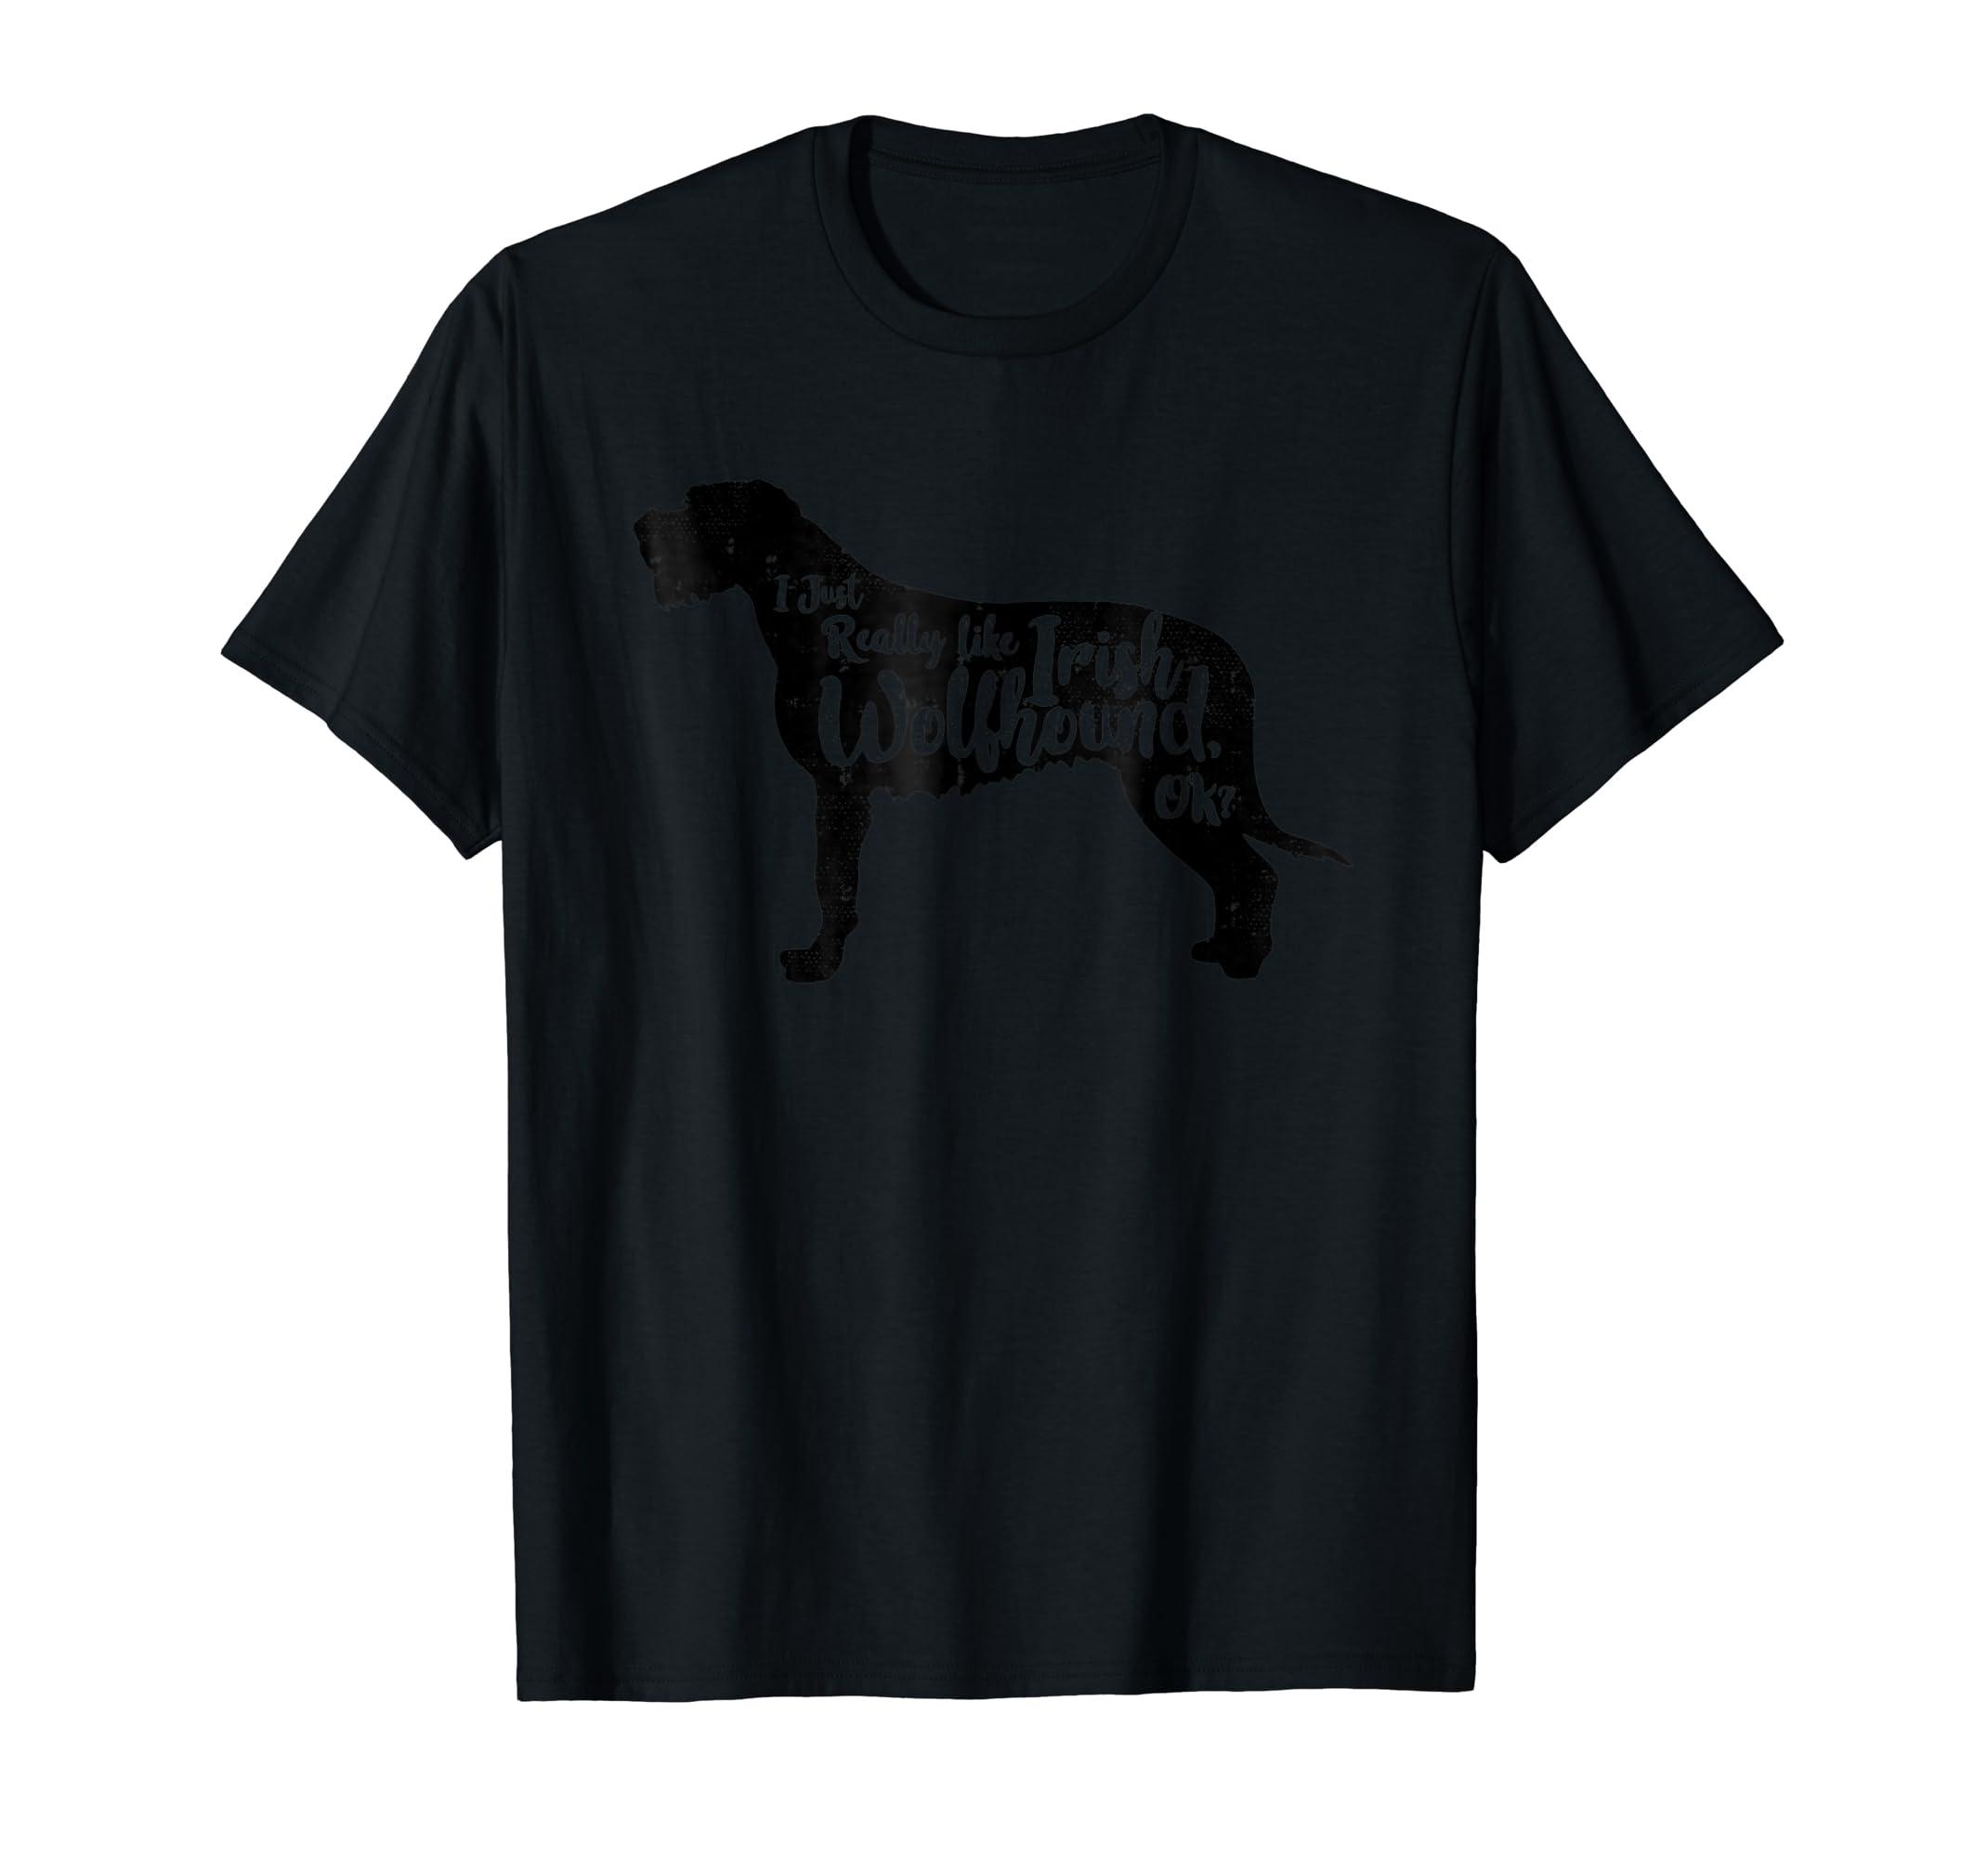 I Just Really Like Irish Wolfhound, OK? T Shirt Love Dog-Men's T-Shirt-Black